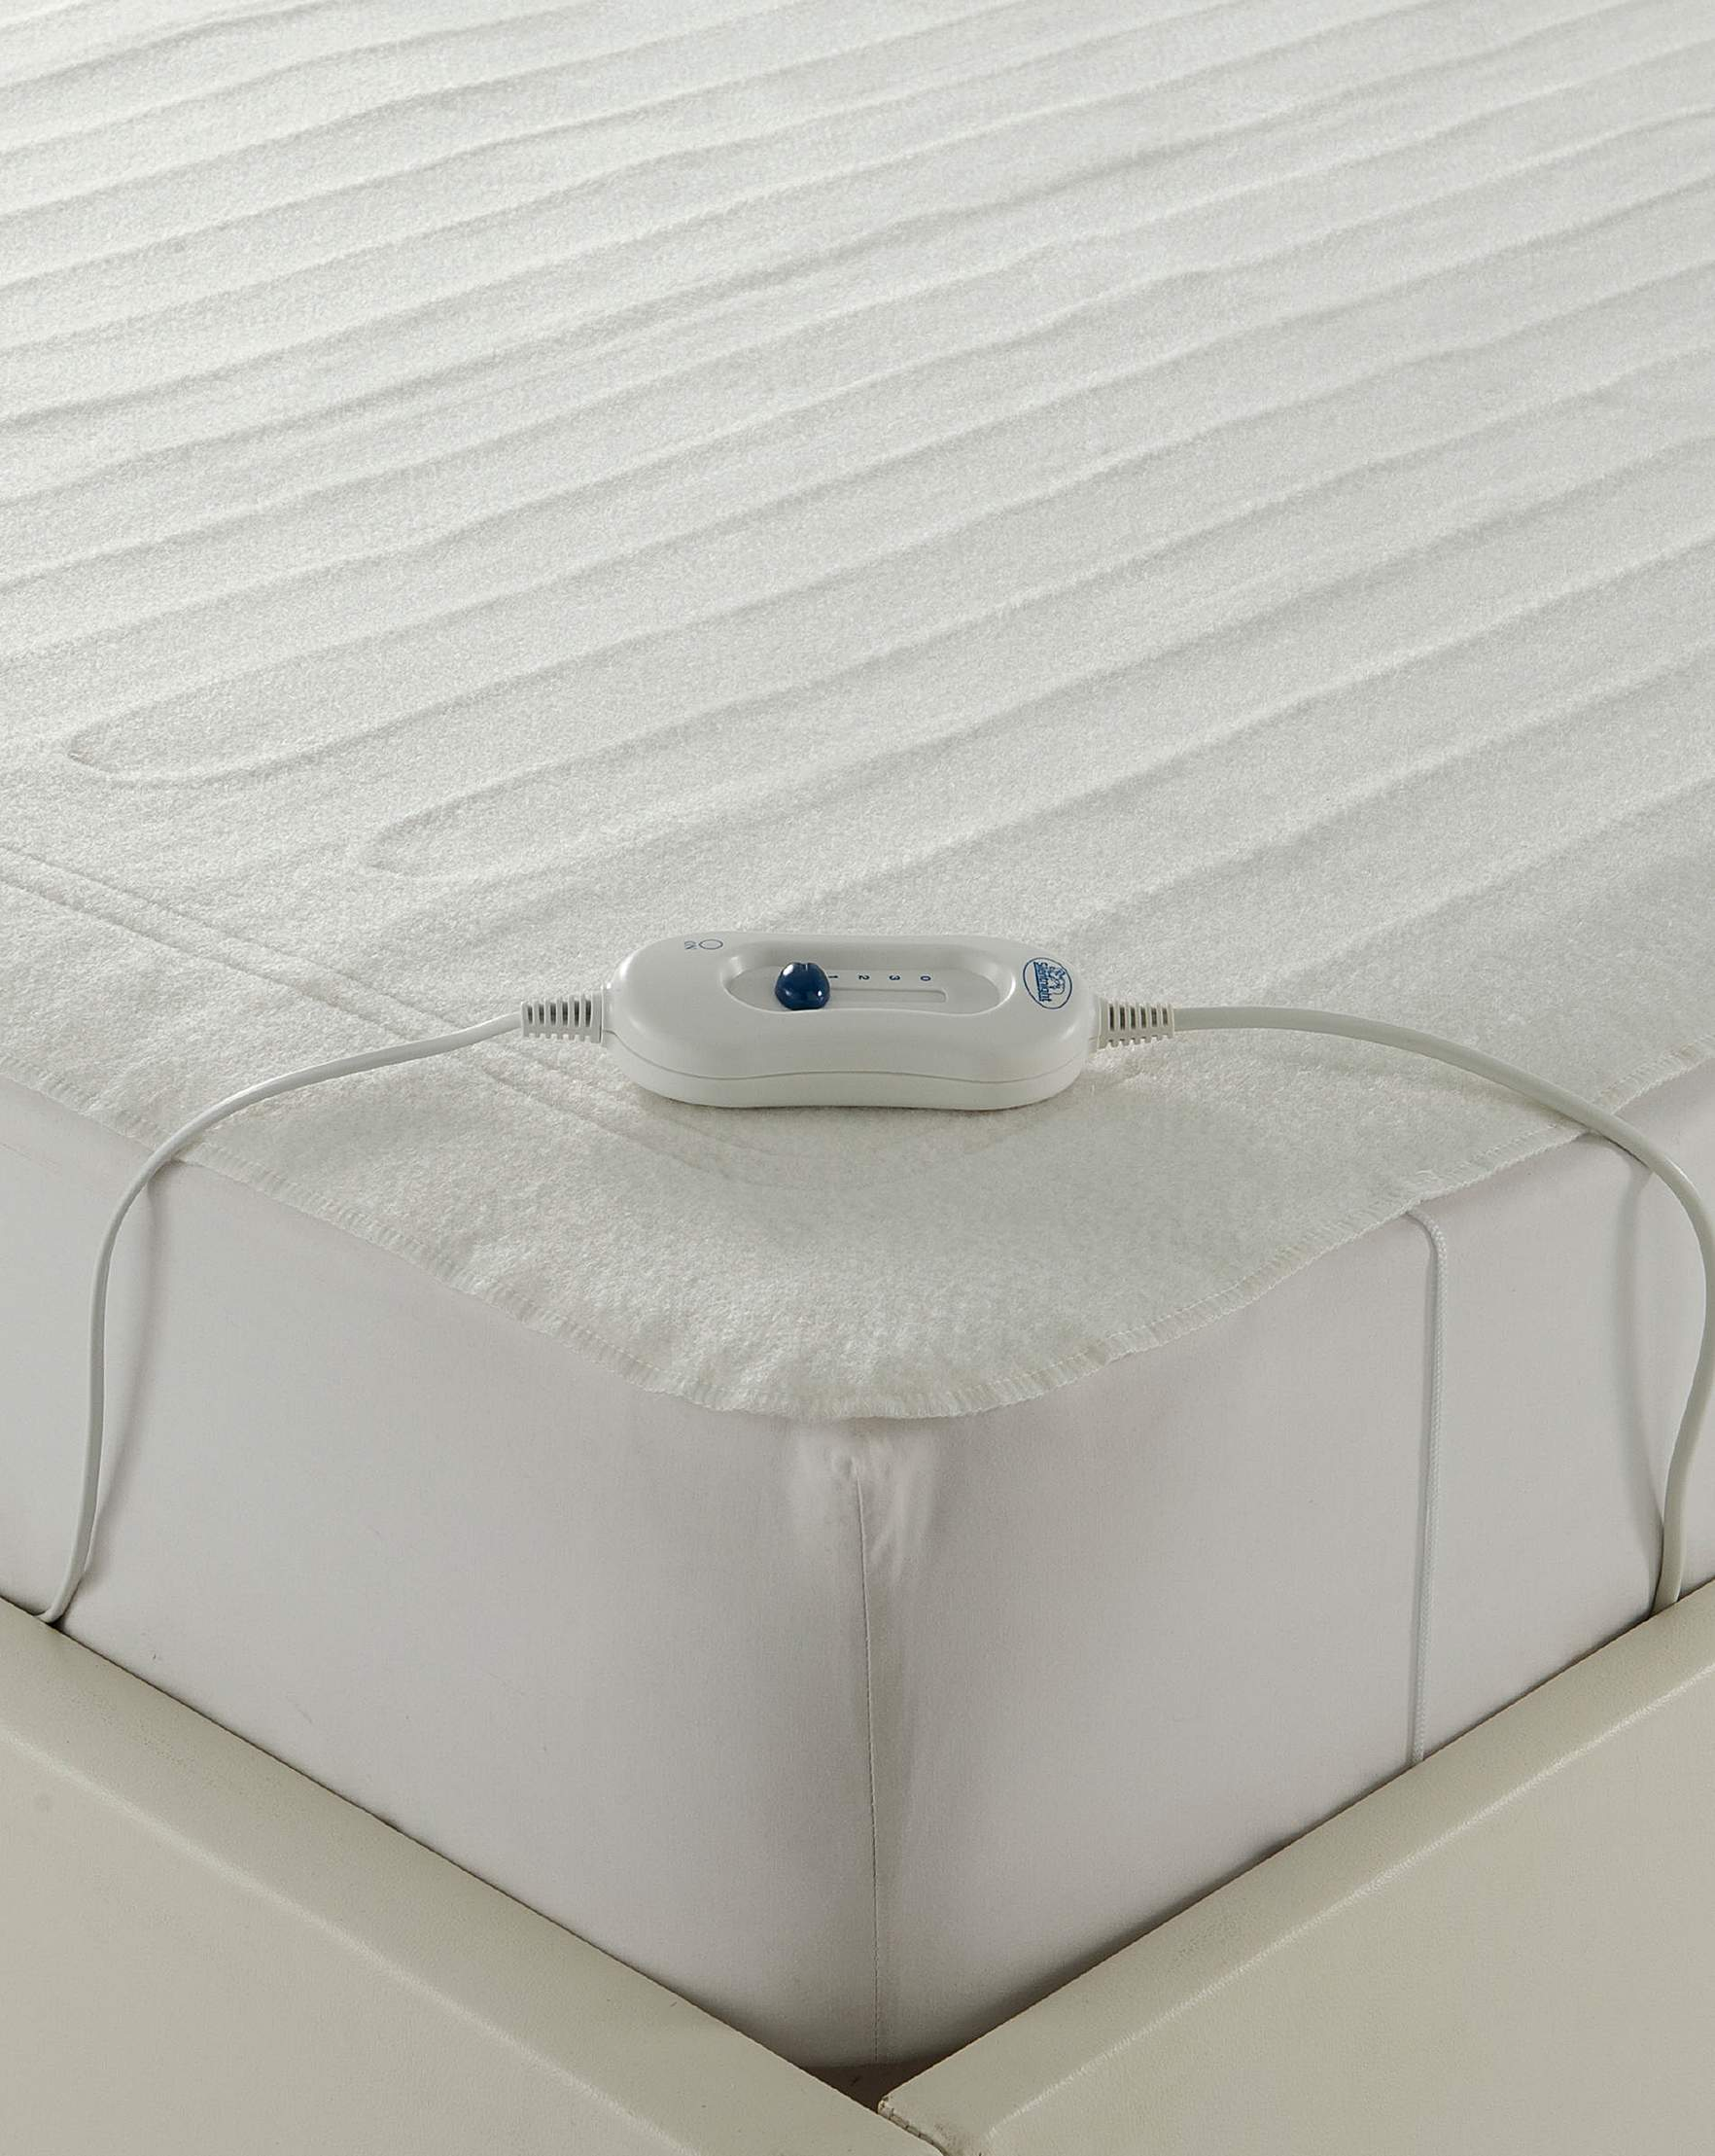 7796ff58038 Comfort Control Electric Blanket